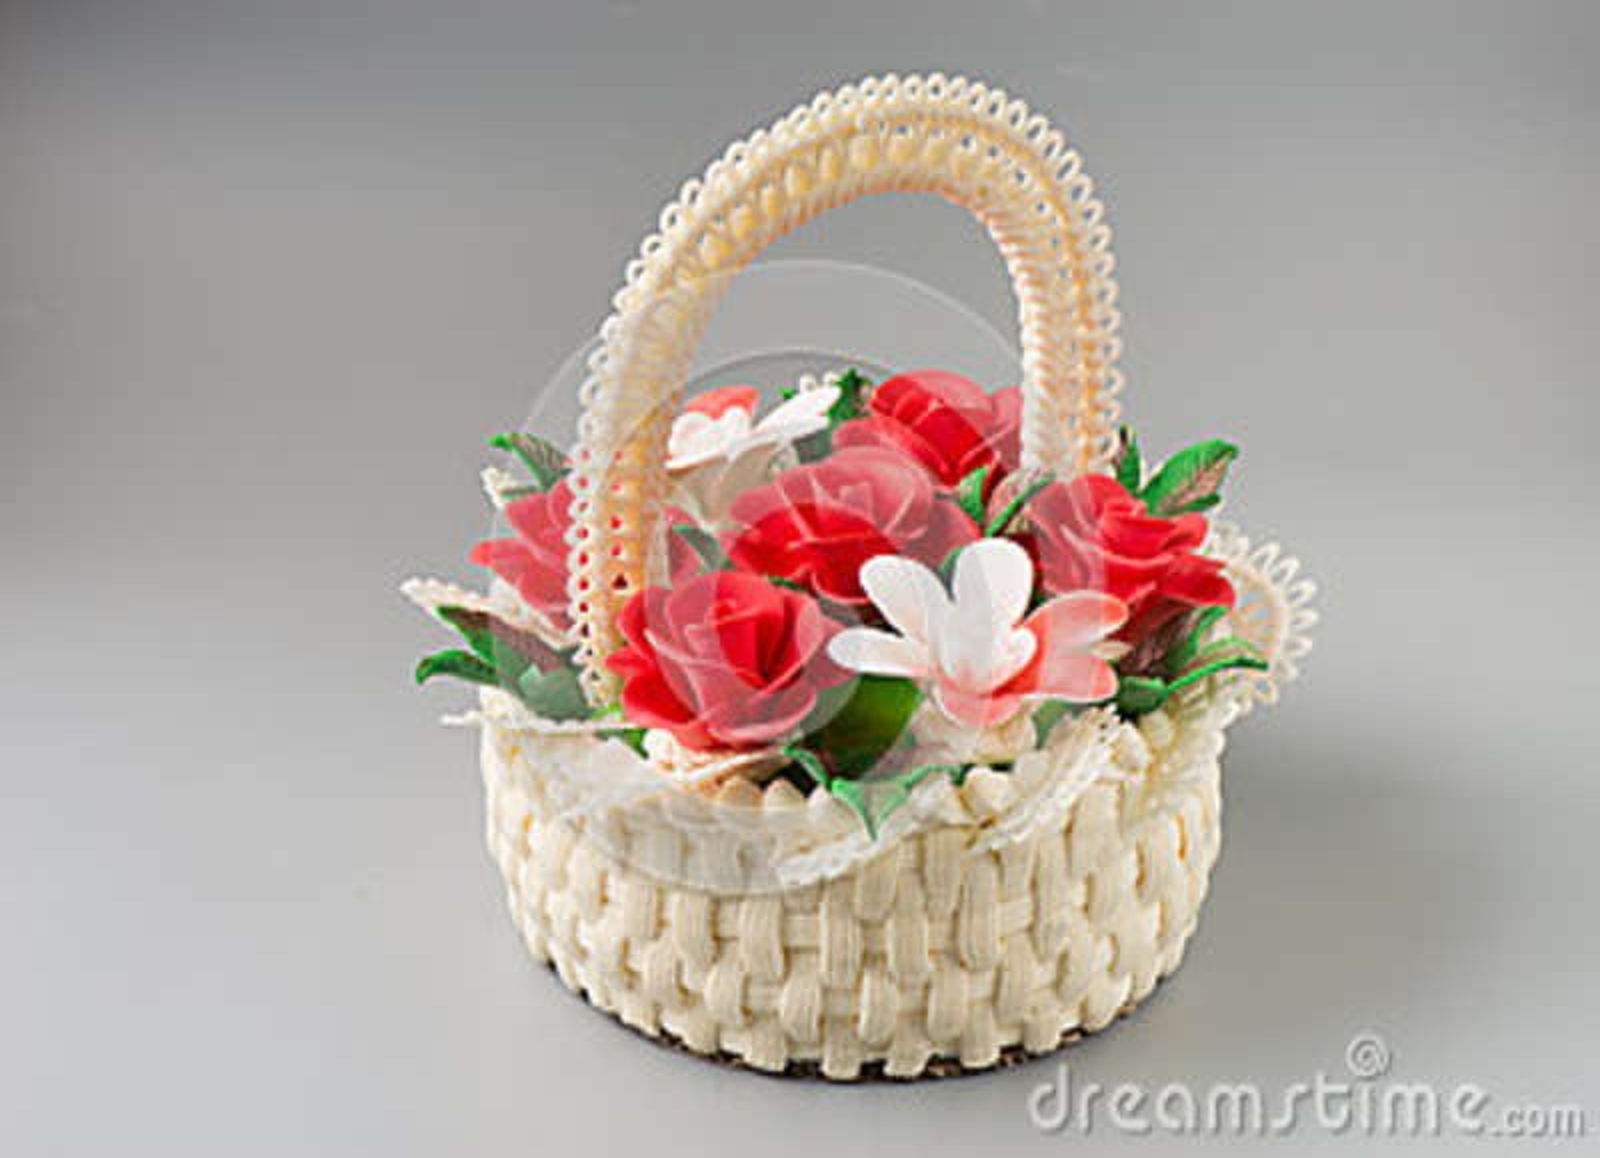 Figure Cake Stock Photo Image Of Colorful Birthday 50518090